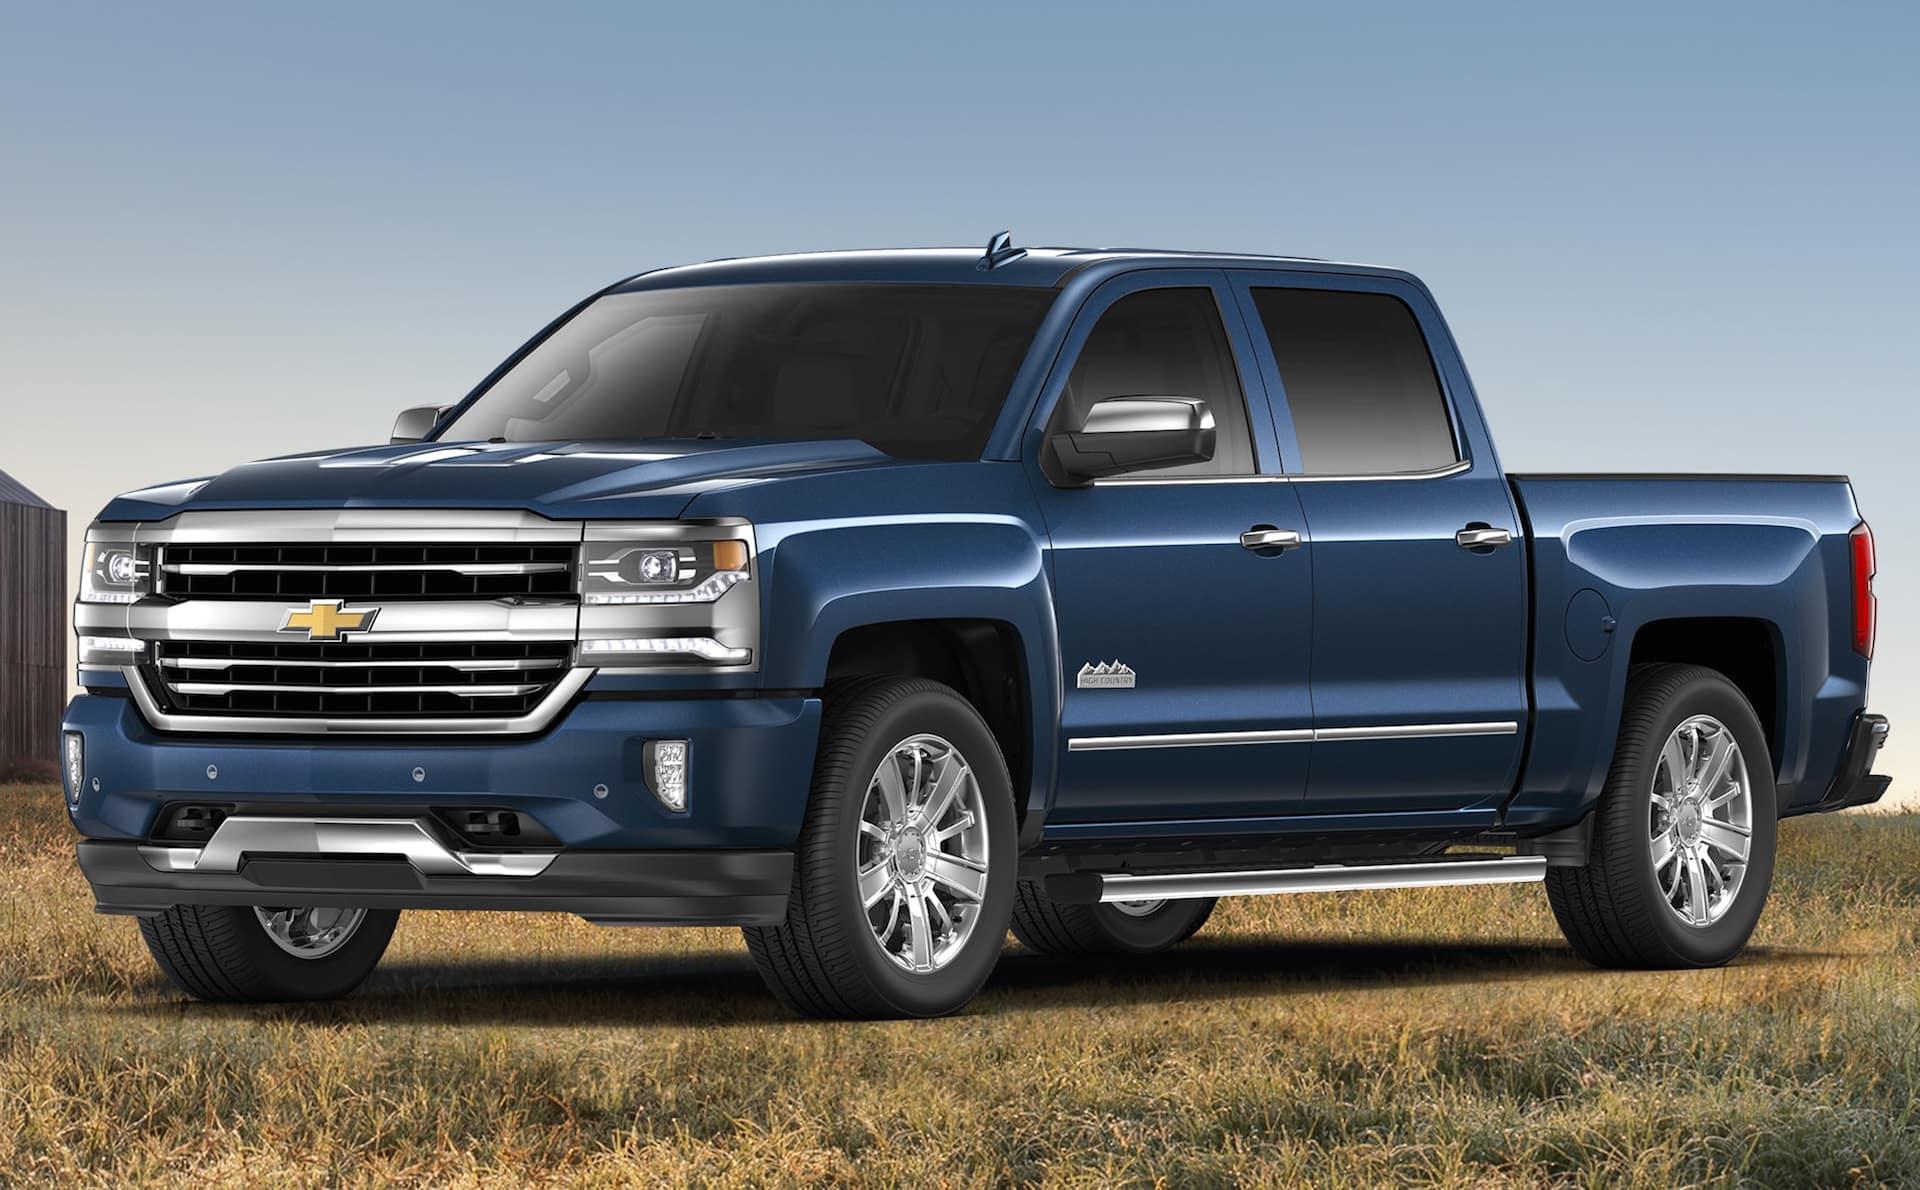 Blue Book Value Trucks >> Chevrolet Cheyenne High Country 2018   New Aston Martin Release Date